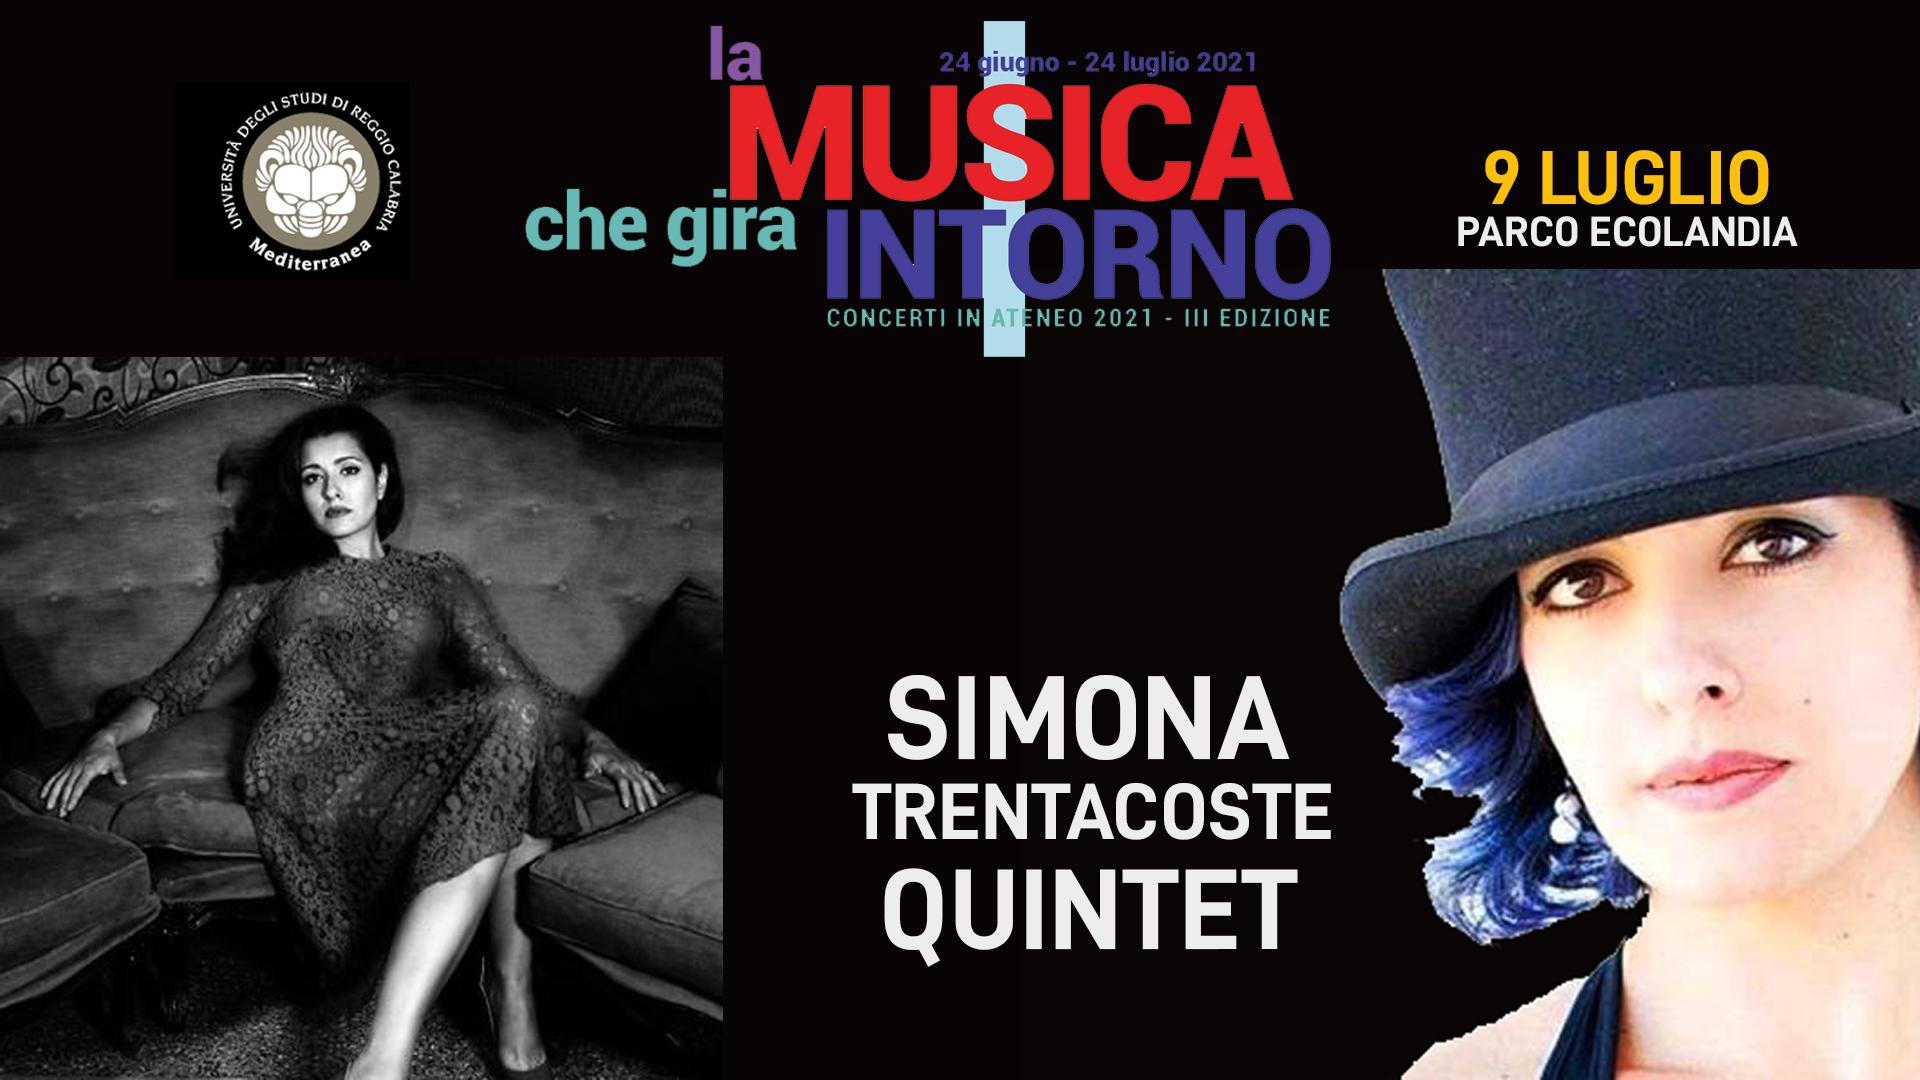 Simona Trentacoste Quintet